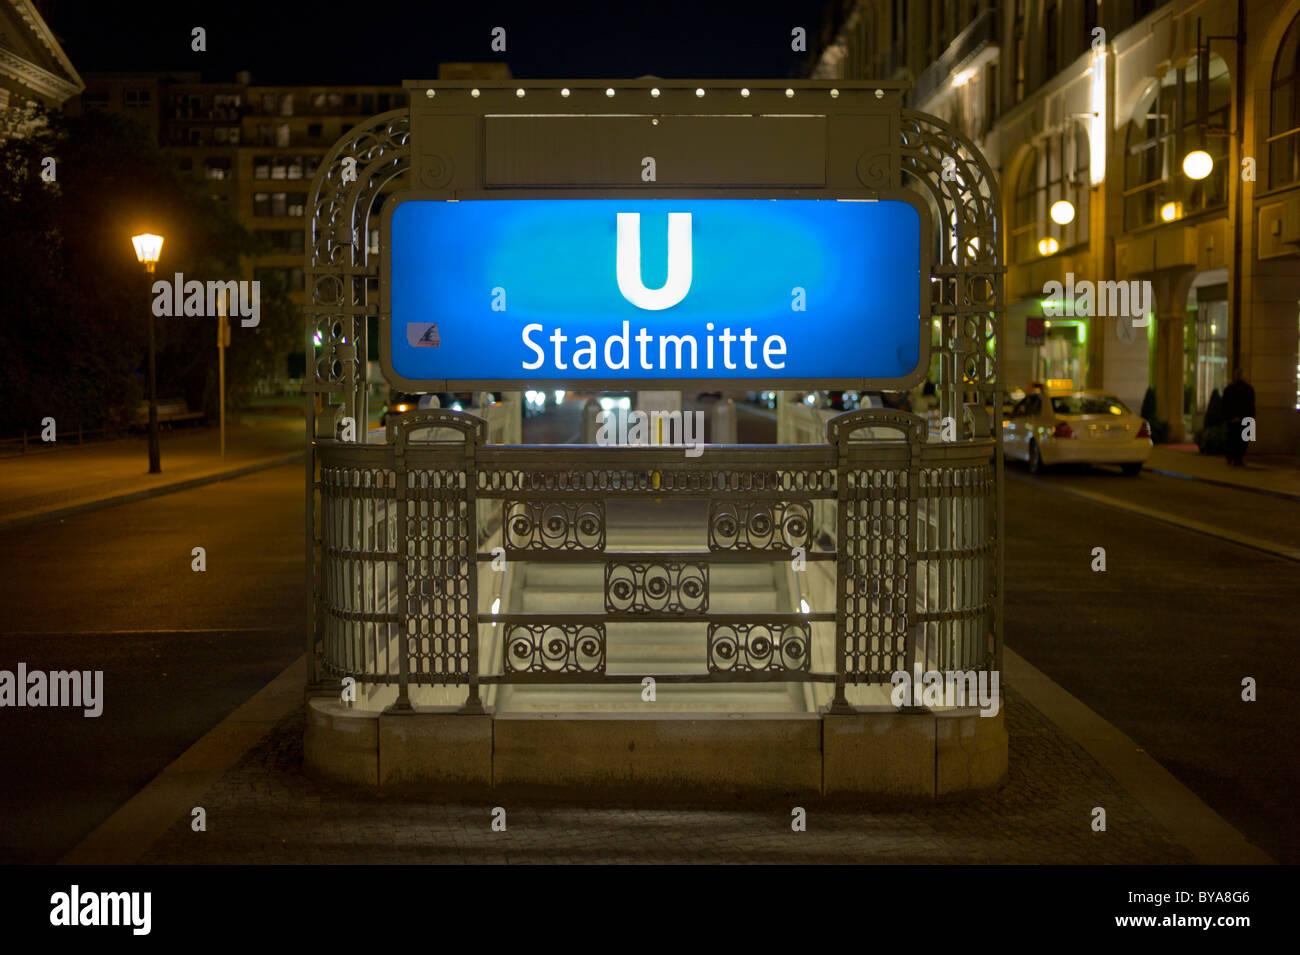 U-Bahn Station Stadtmitte, subway station, Berlin, Germany, Europe - Stock Image